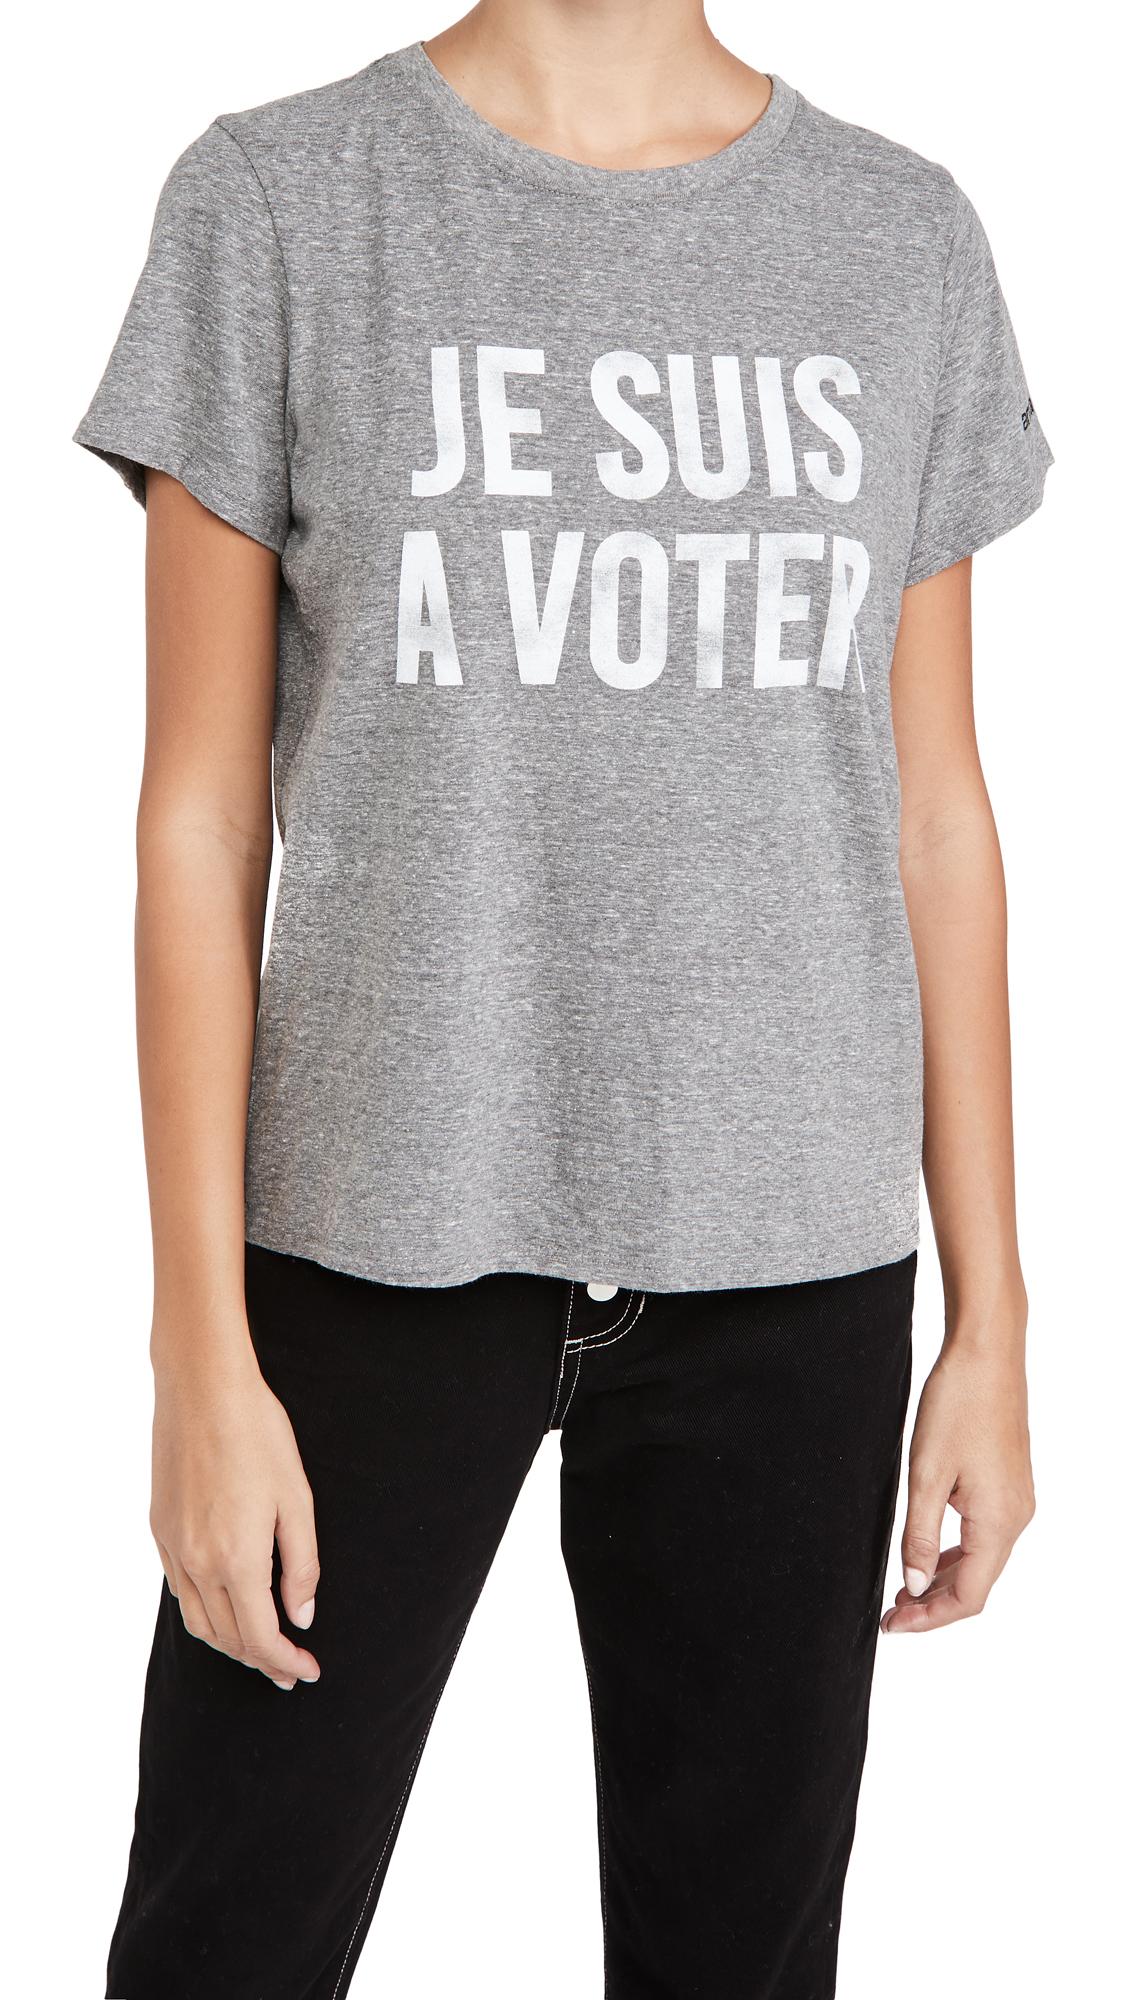 Cinq a Sept x I Am A Voter Je Suis A Voter Tee